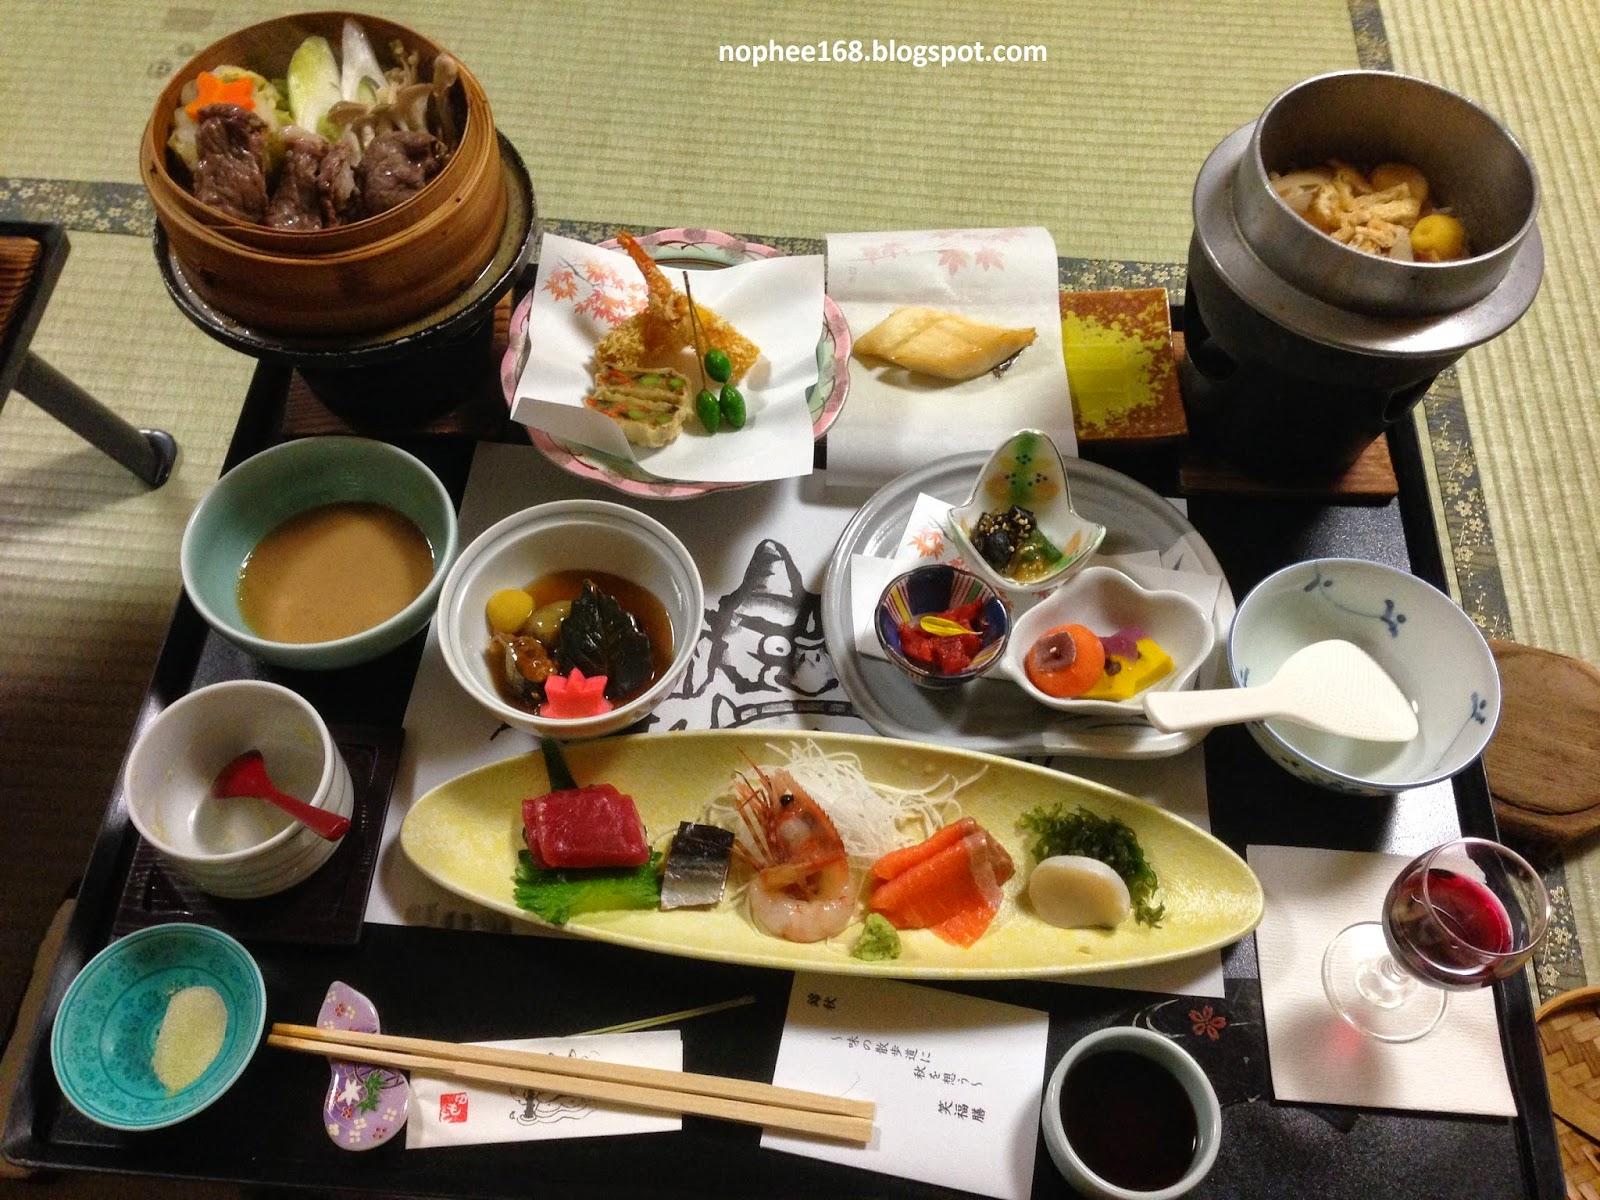 Japanese style dinner at Yumoto Noboribetsu